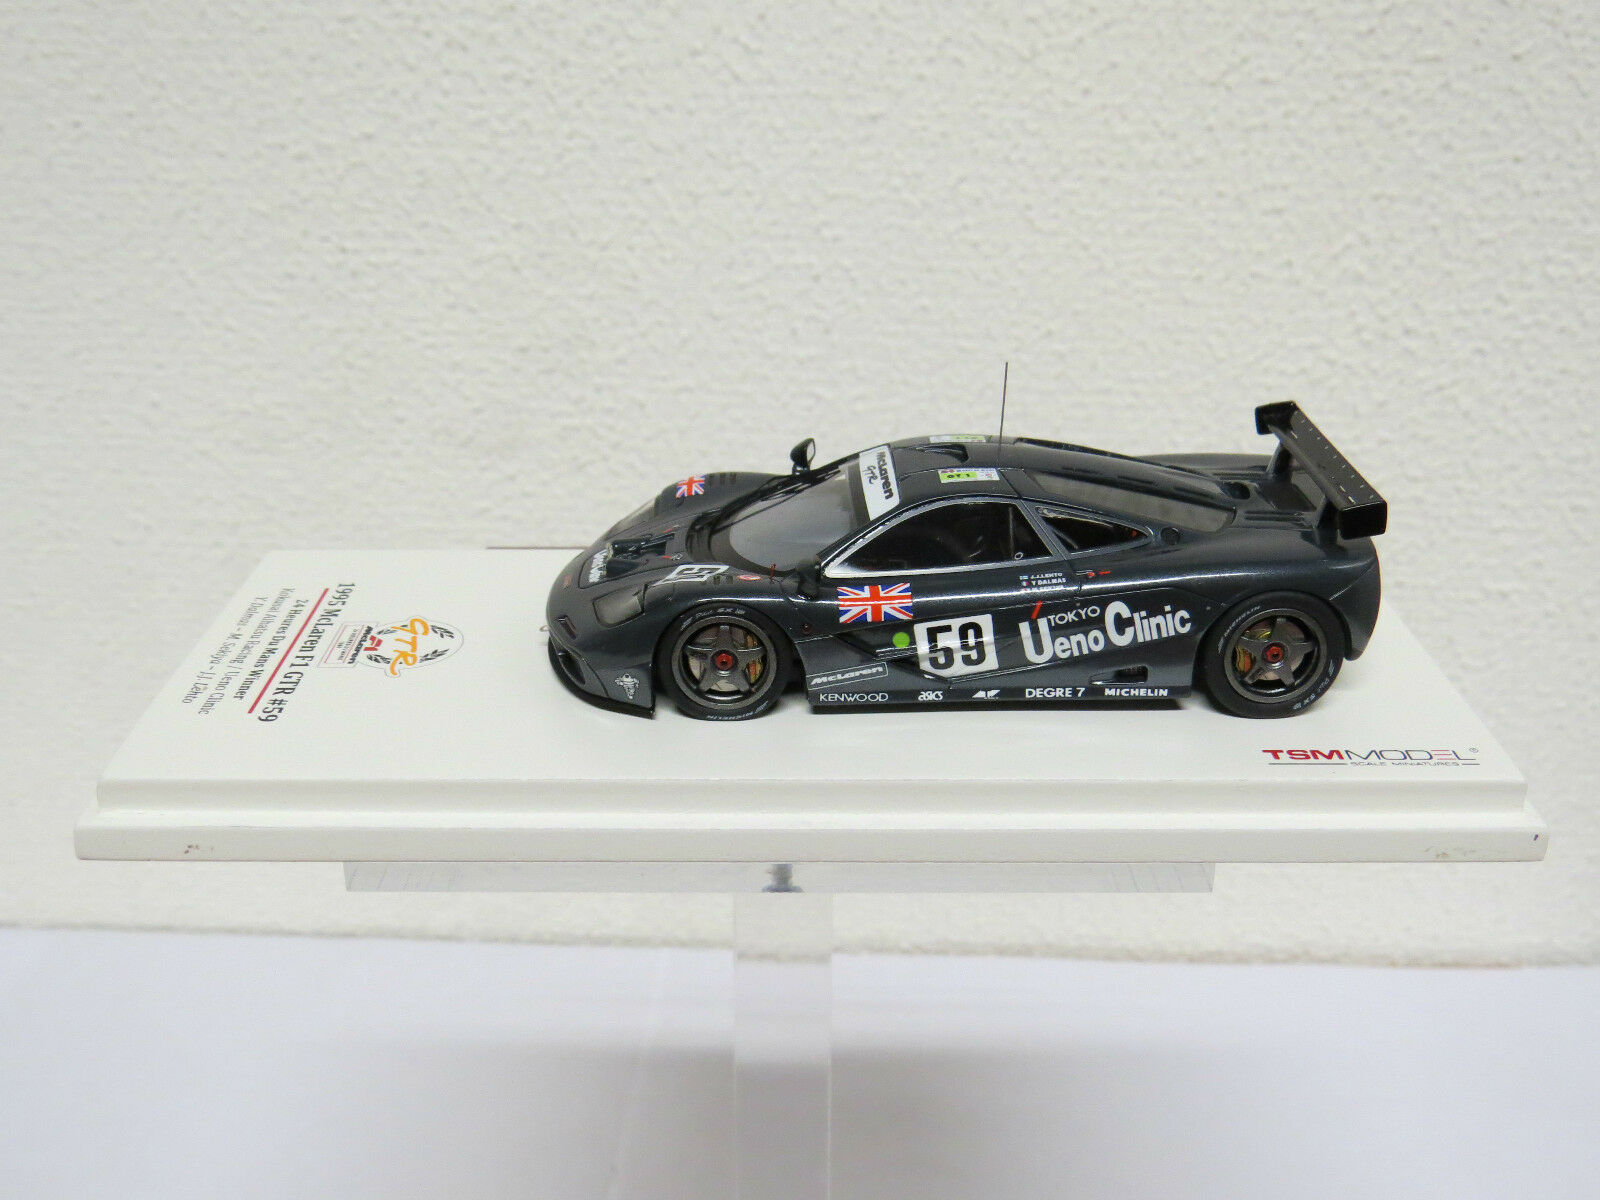 McLaren F1  GTR  59  24H Le Mans Winner 1995 Y. Dalmas - M. Sekiya - J.J. Lehto  no.1 en ligne